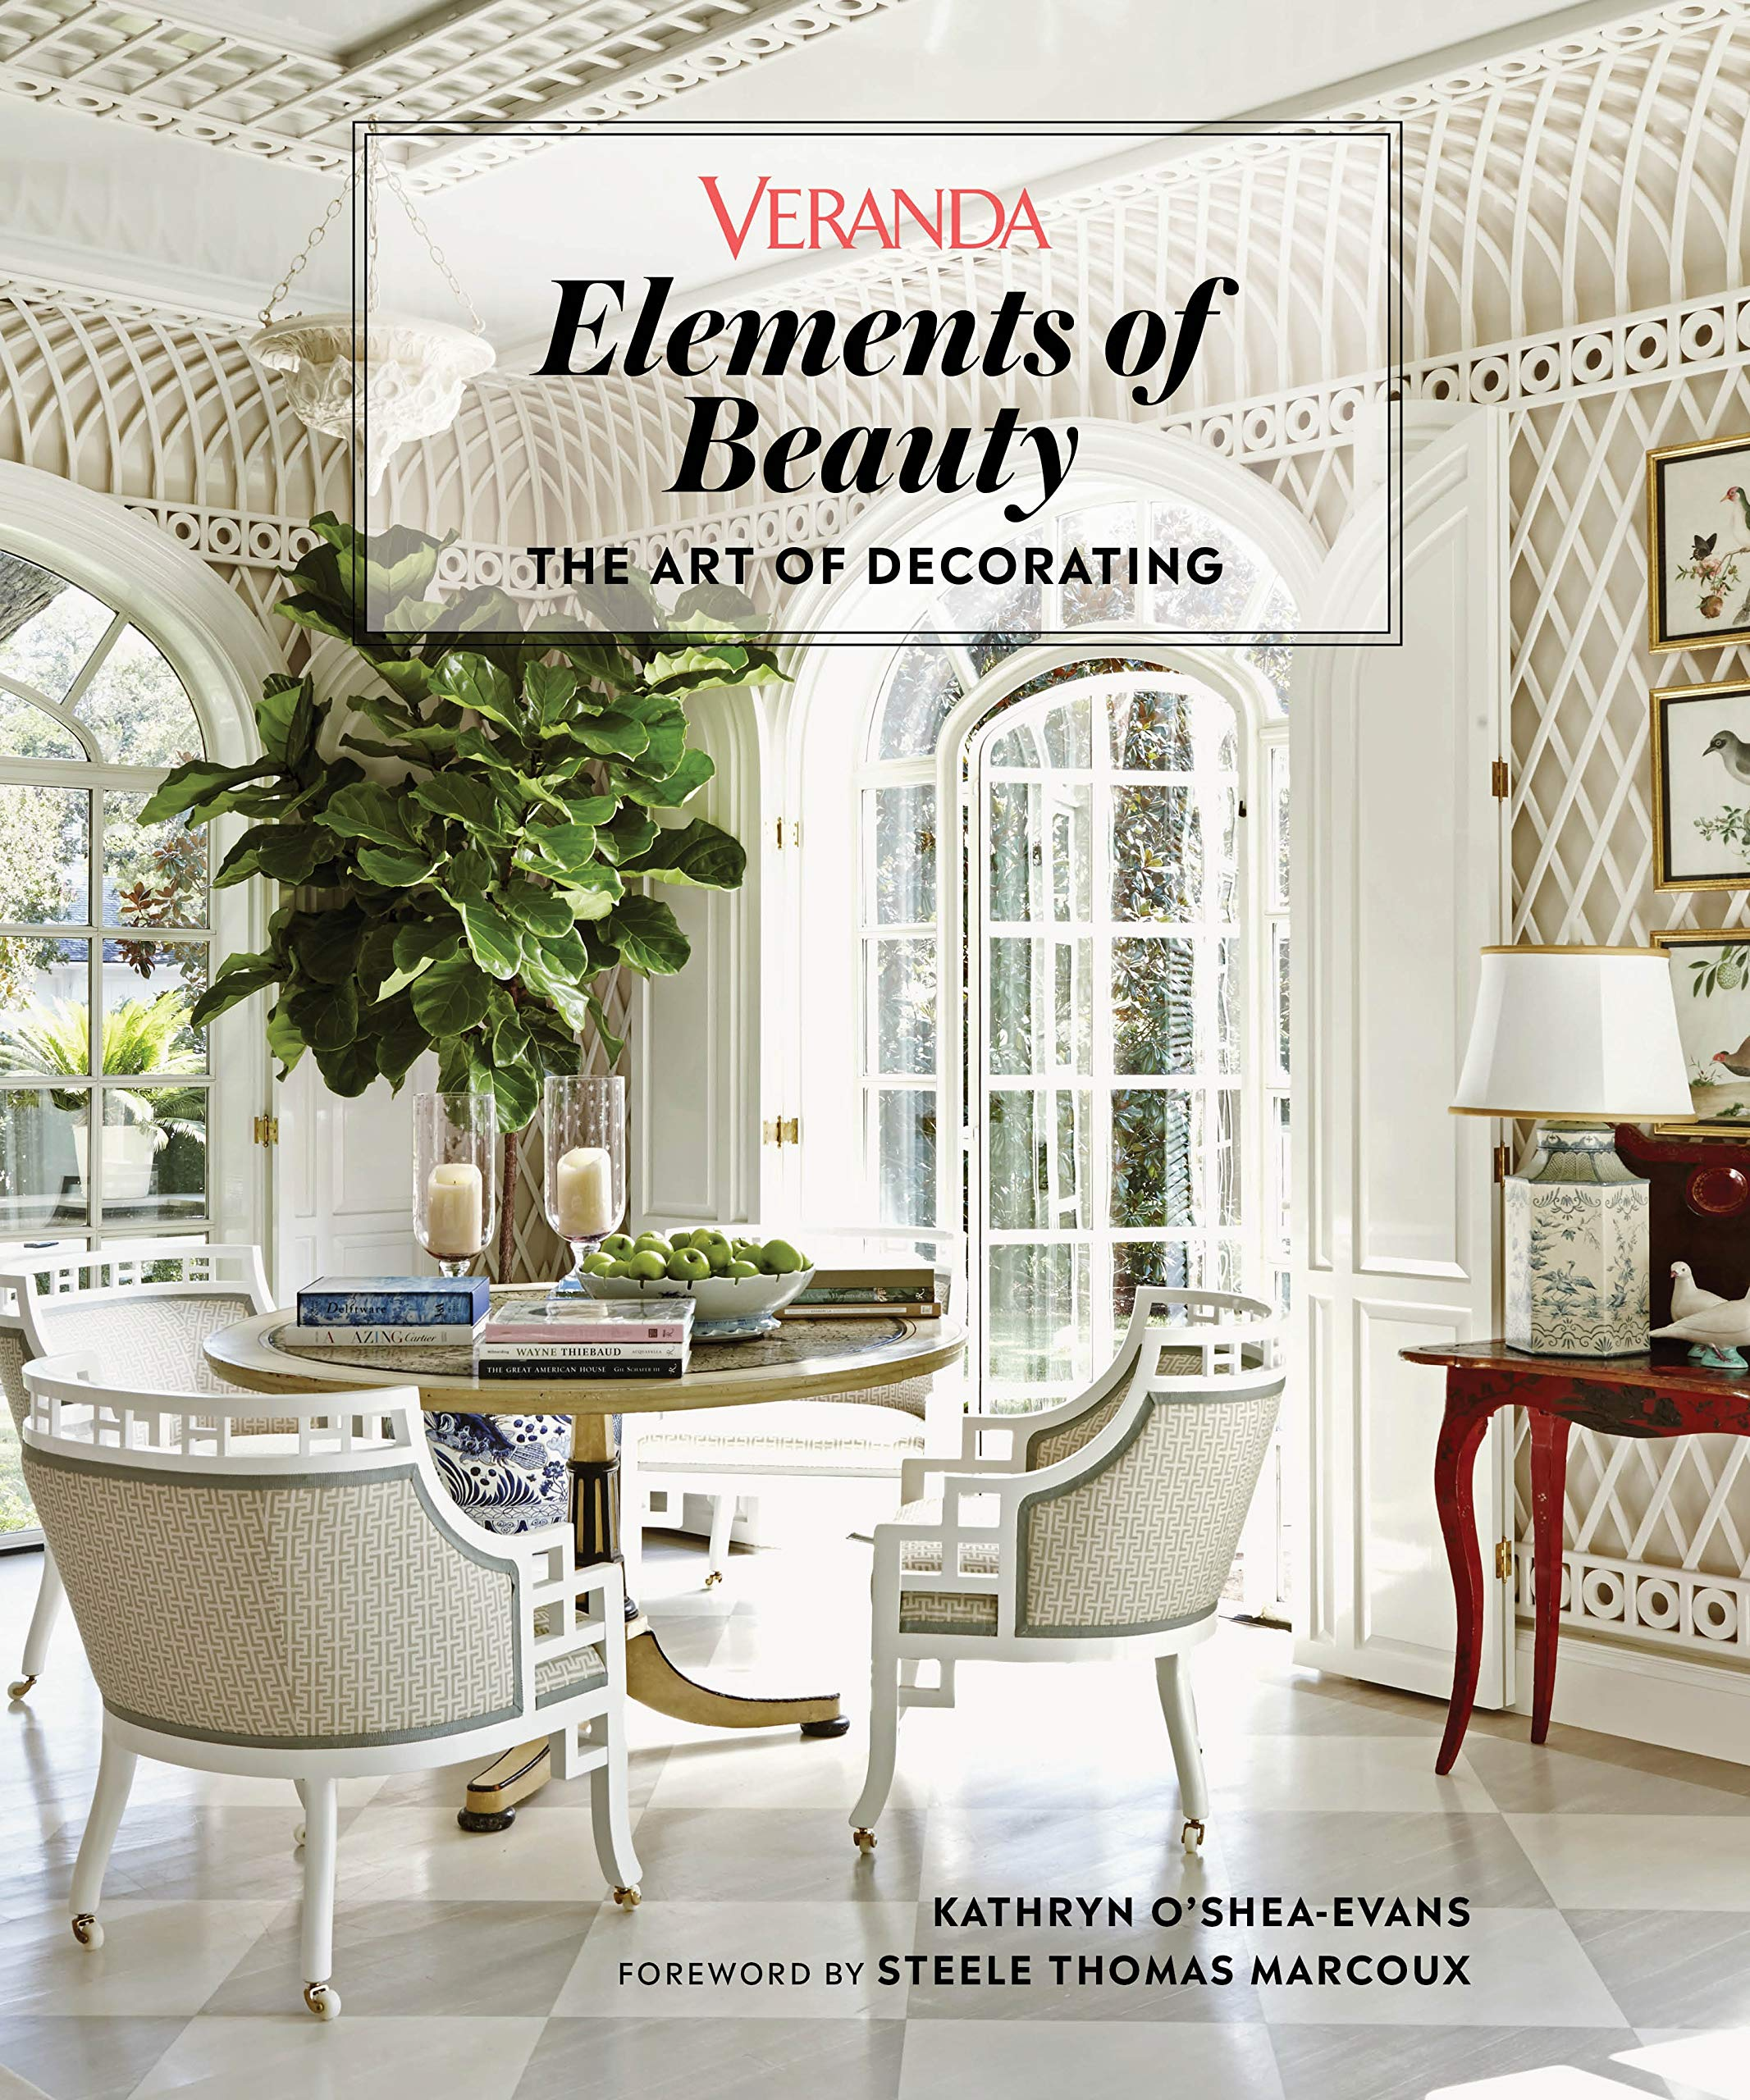 Amazon Veranda Elements Of Beauty The Art Of Decorating Marcoux Steele Veranda O Shea Evans Kathryn Decorating